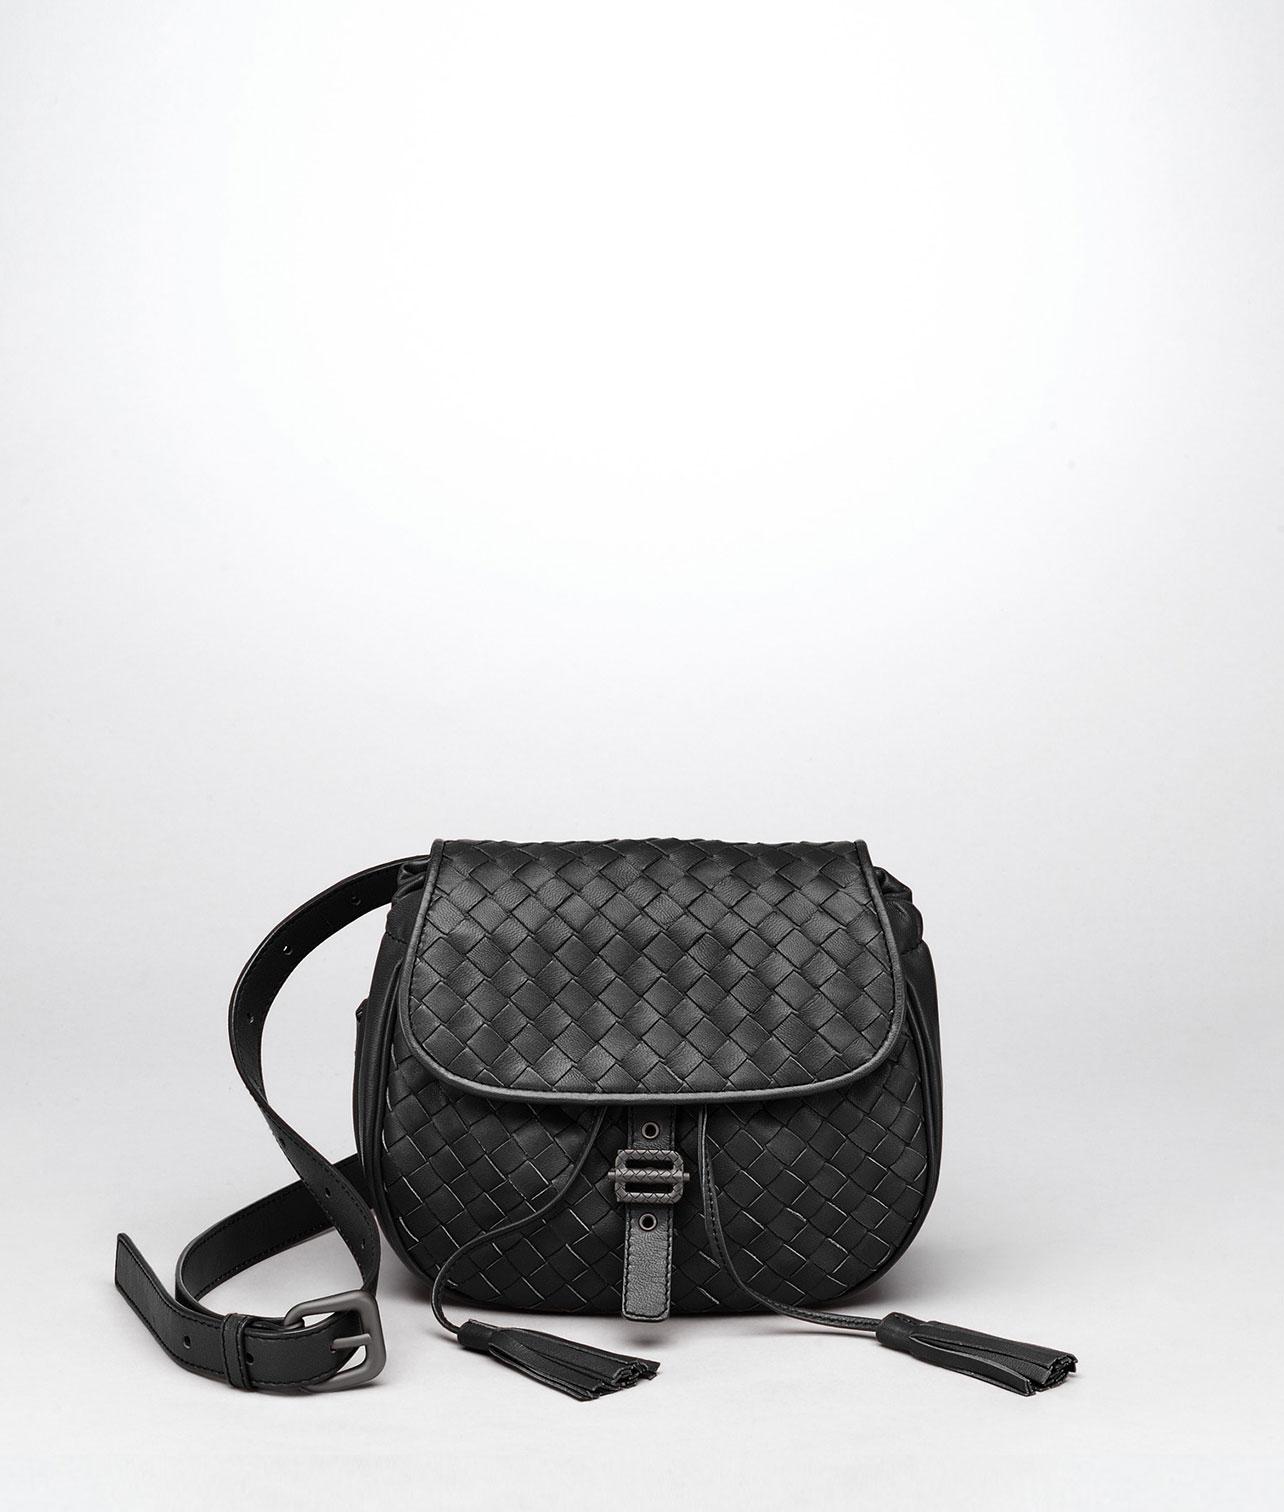 Borse Estate Bottega Veneta : Lyst bottega veneta nero intrecciato nappa messenger bag